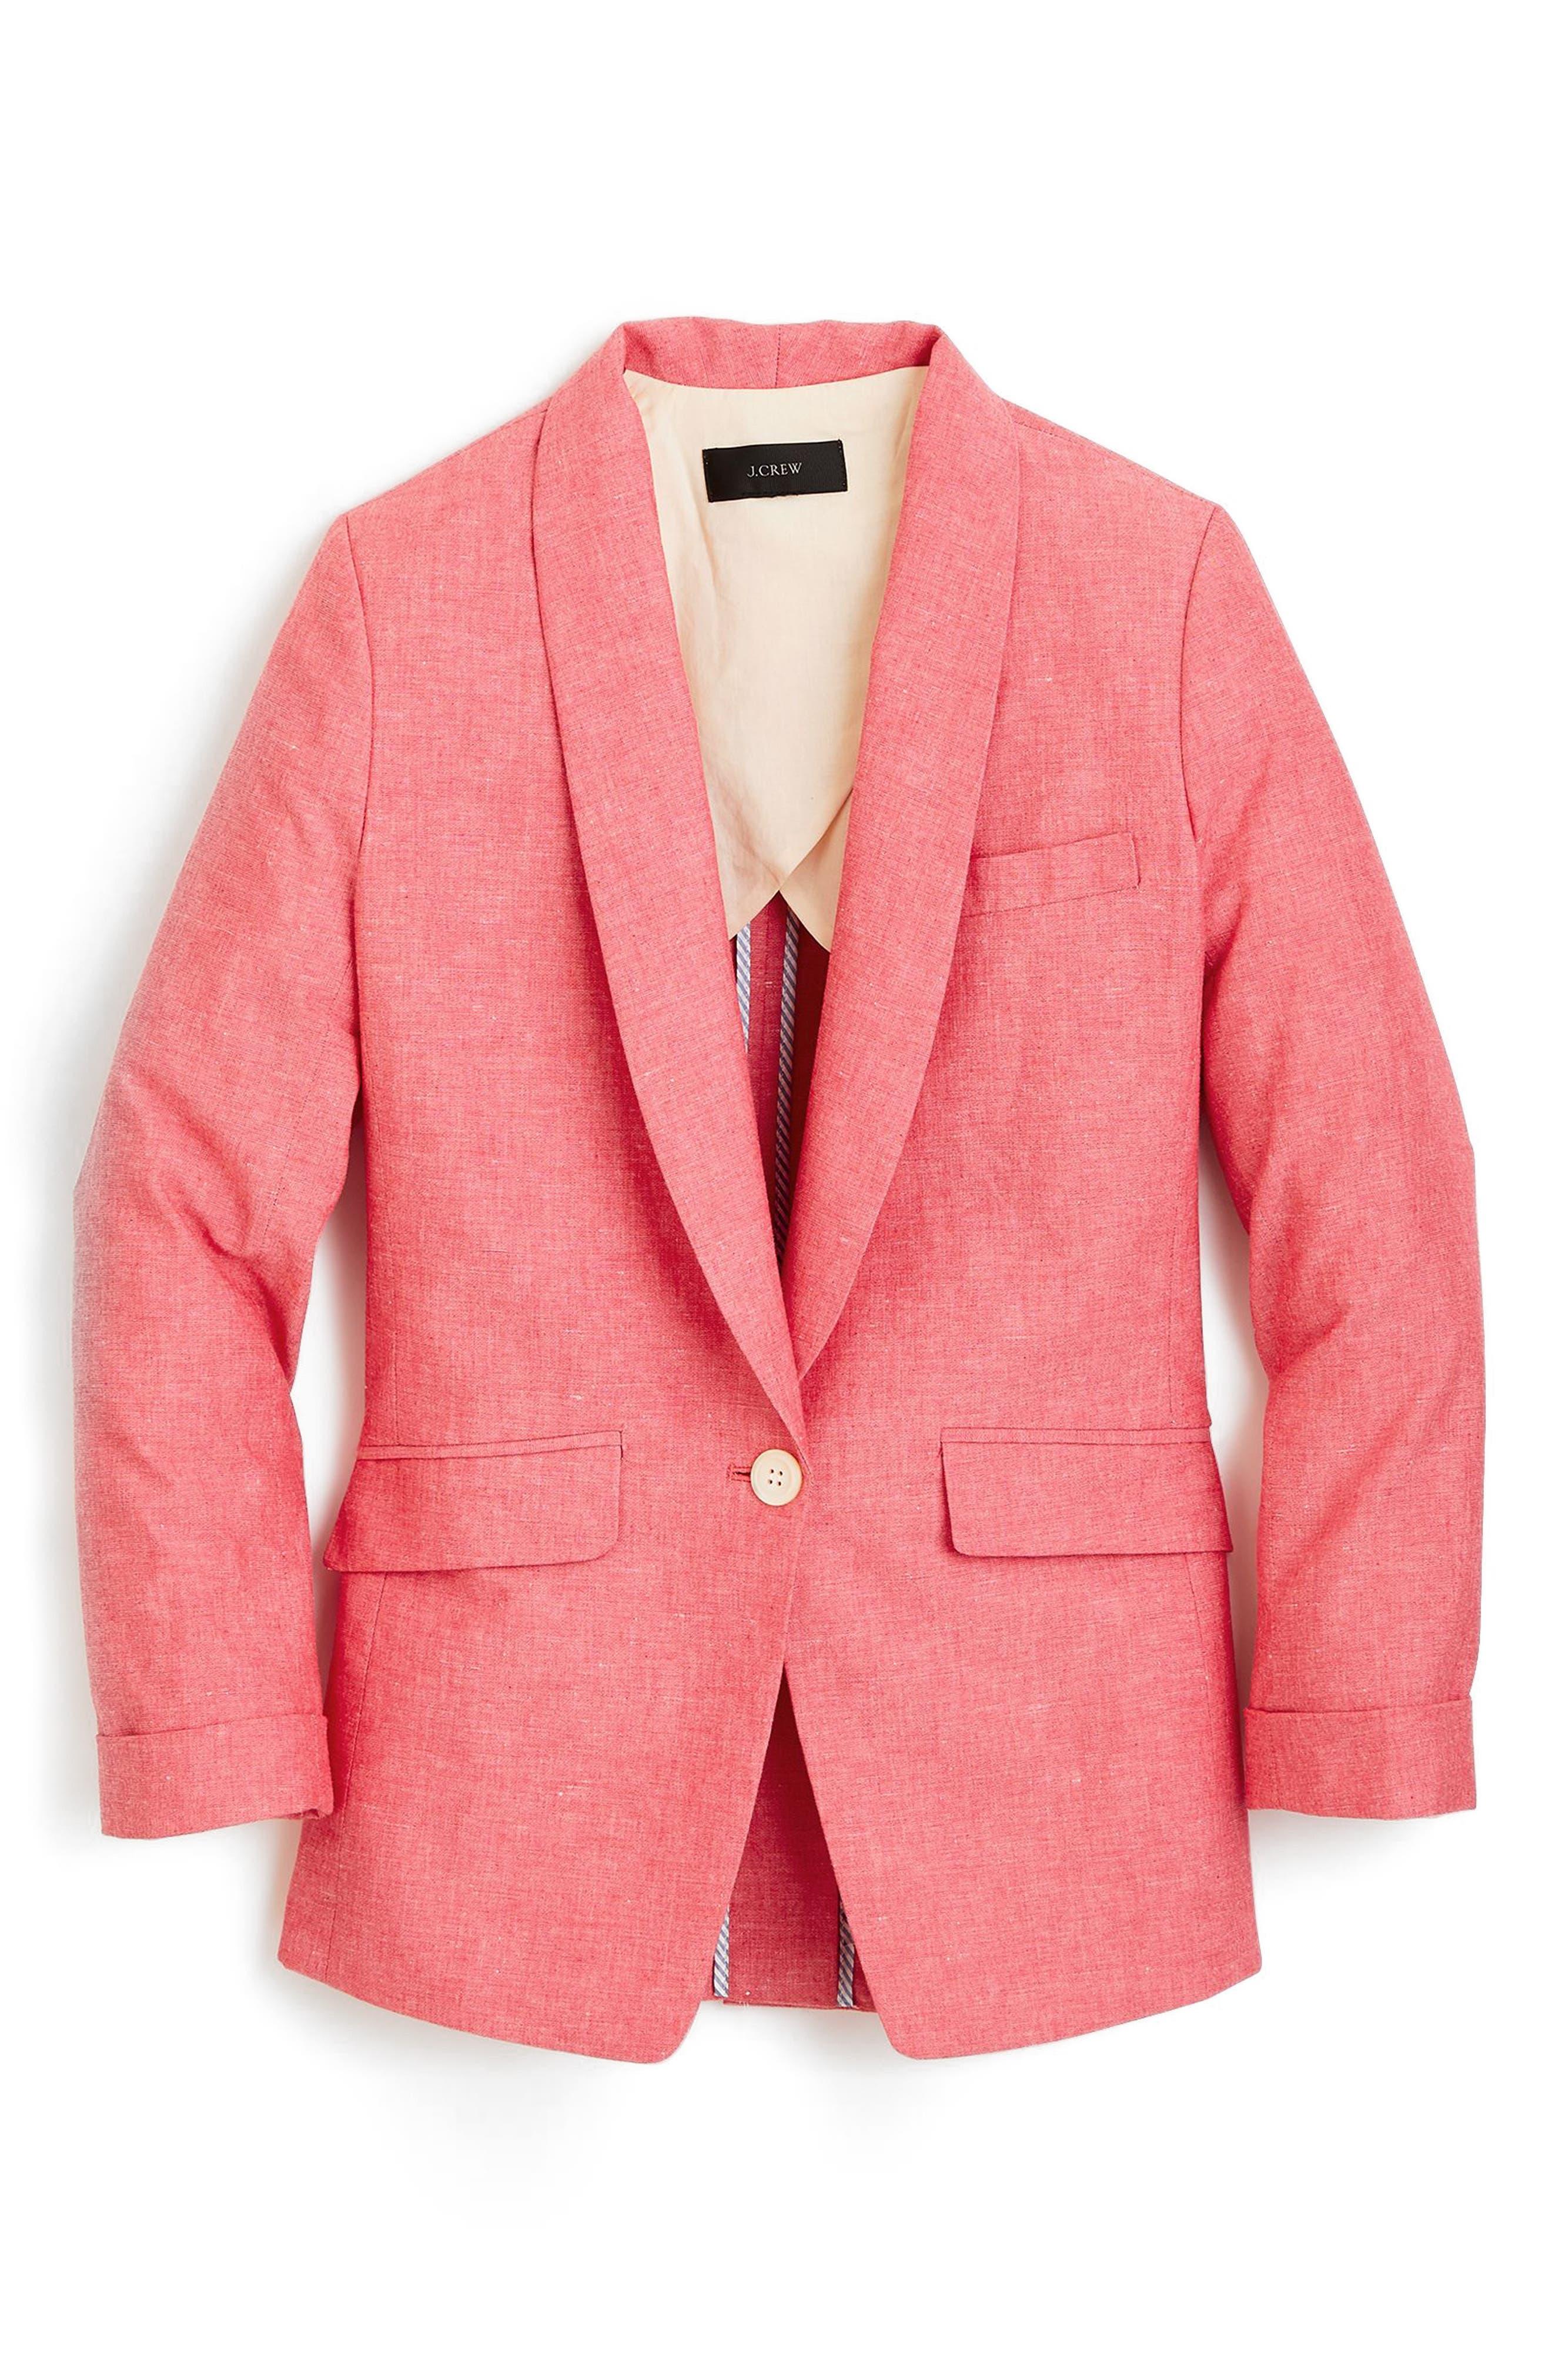 J.Crew Unstructured Shawl Collar Cotton Linen Blazer,                         Main,                         color, Firecracker Red